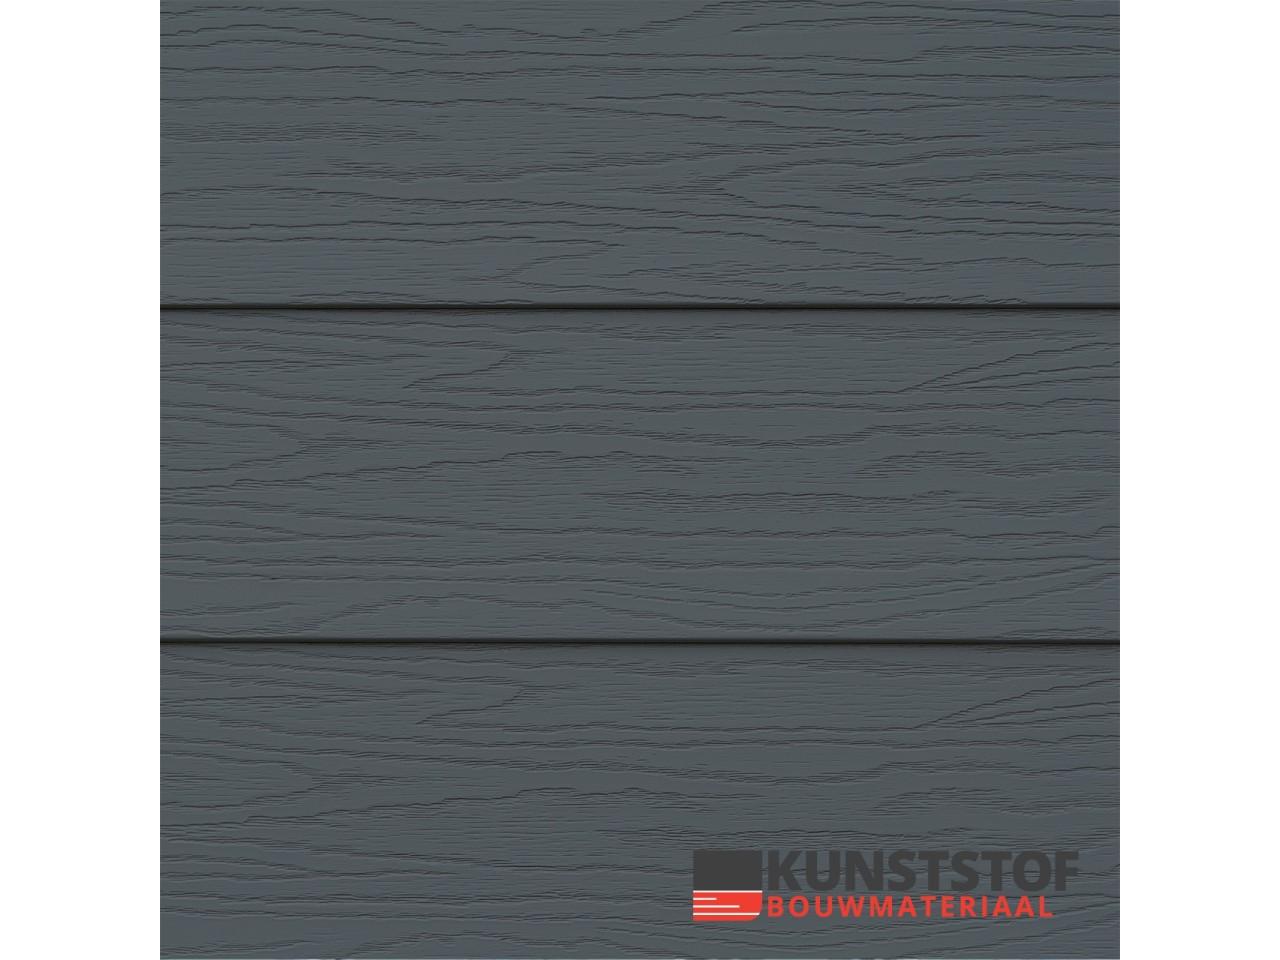 Eurotexx Potdeksel antraciet -donker grijs - RAL 7015- gevelbekleding- Zweeds rabat